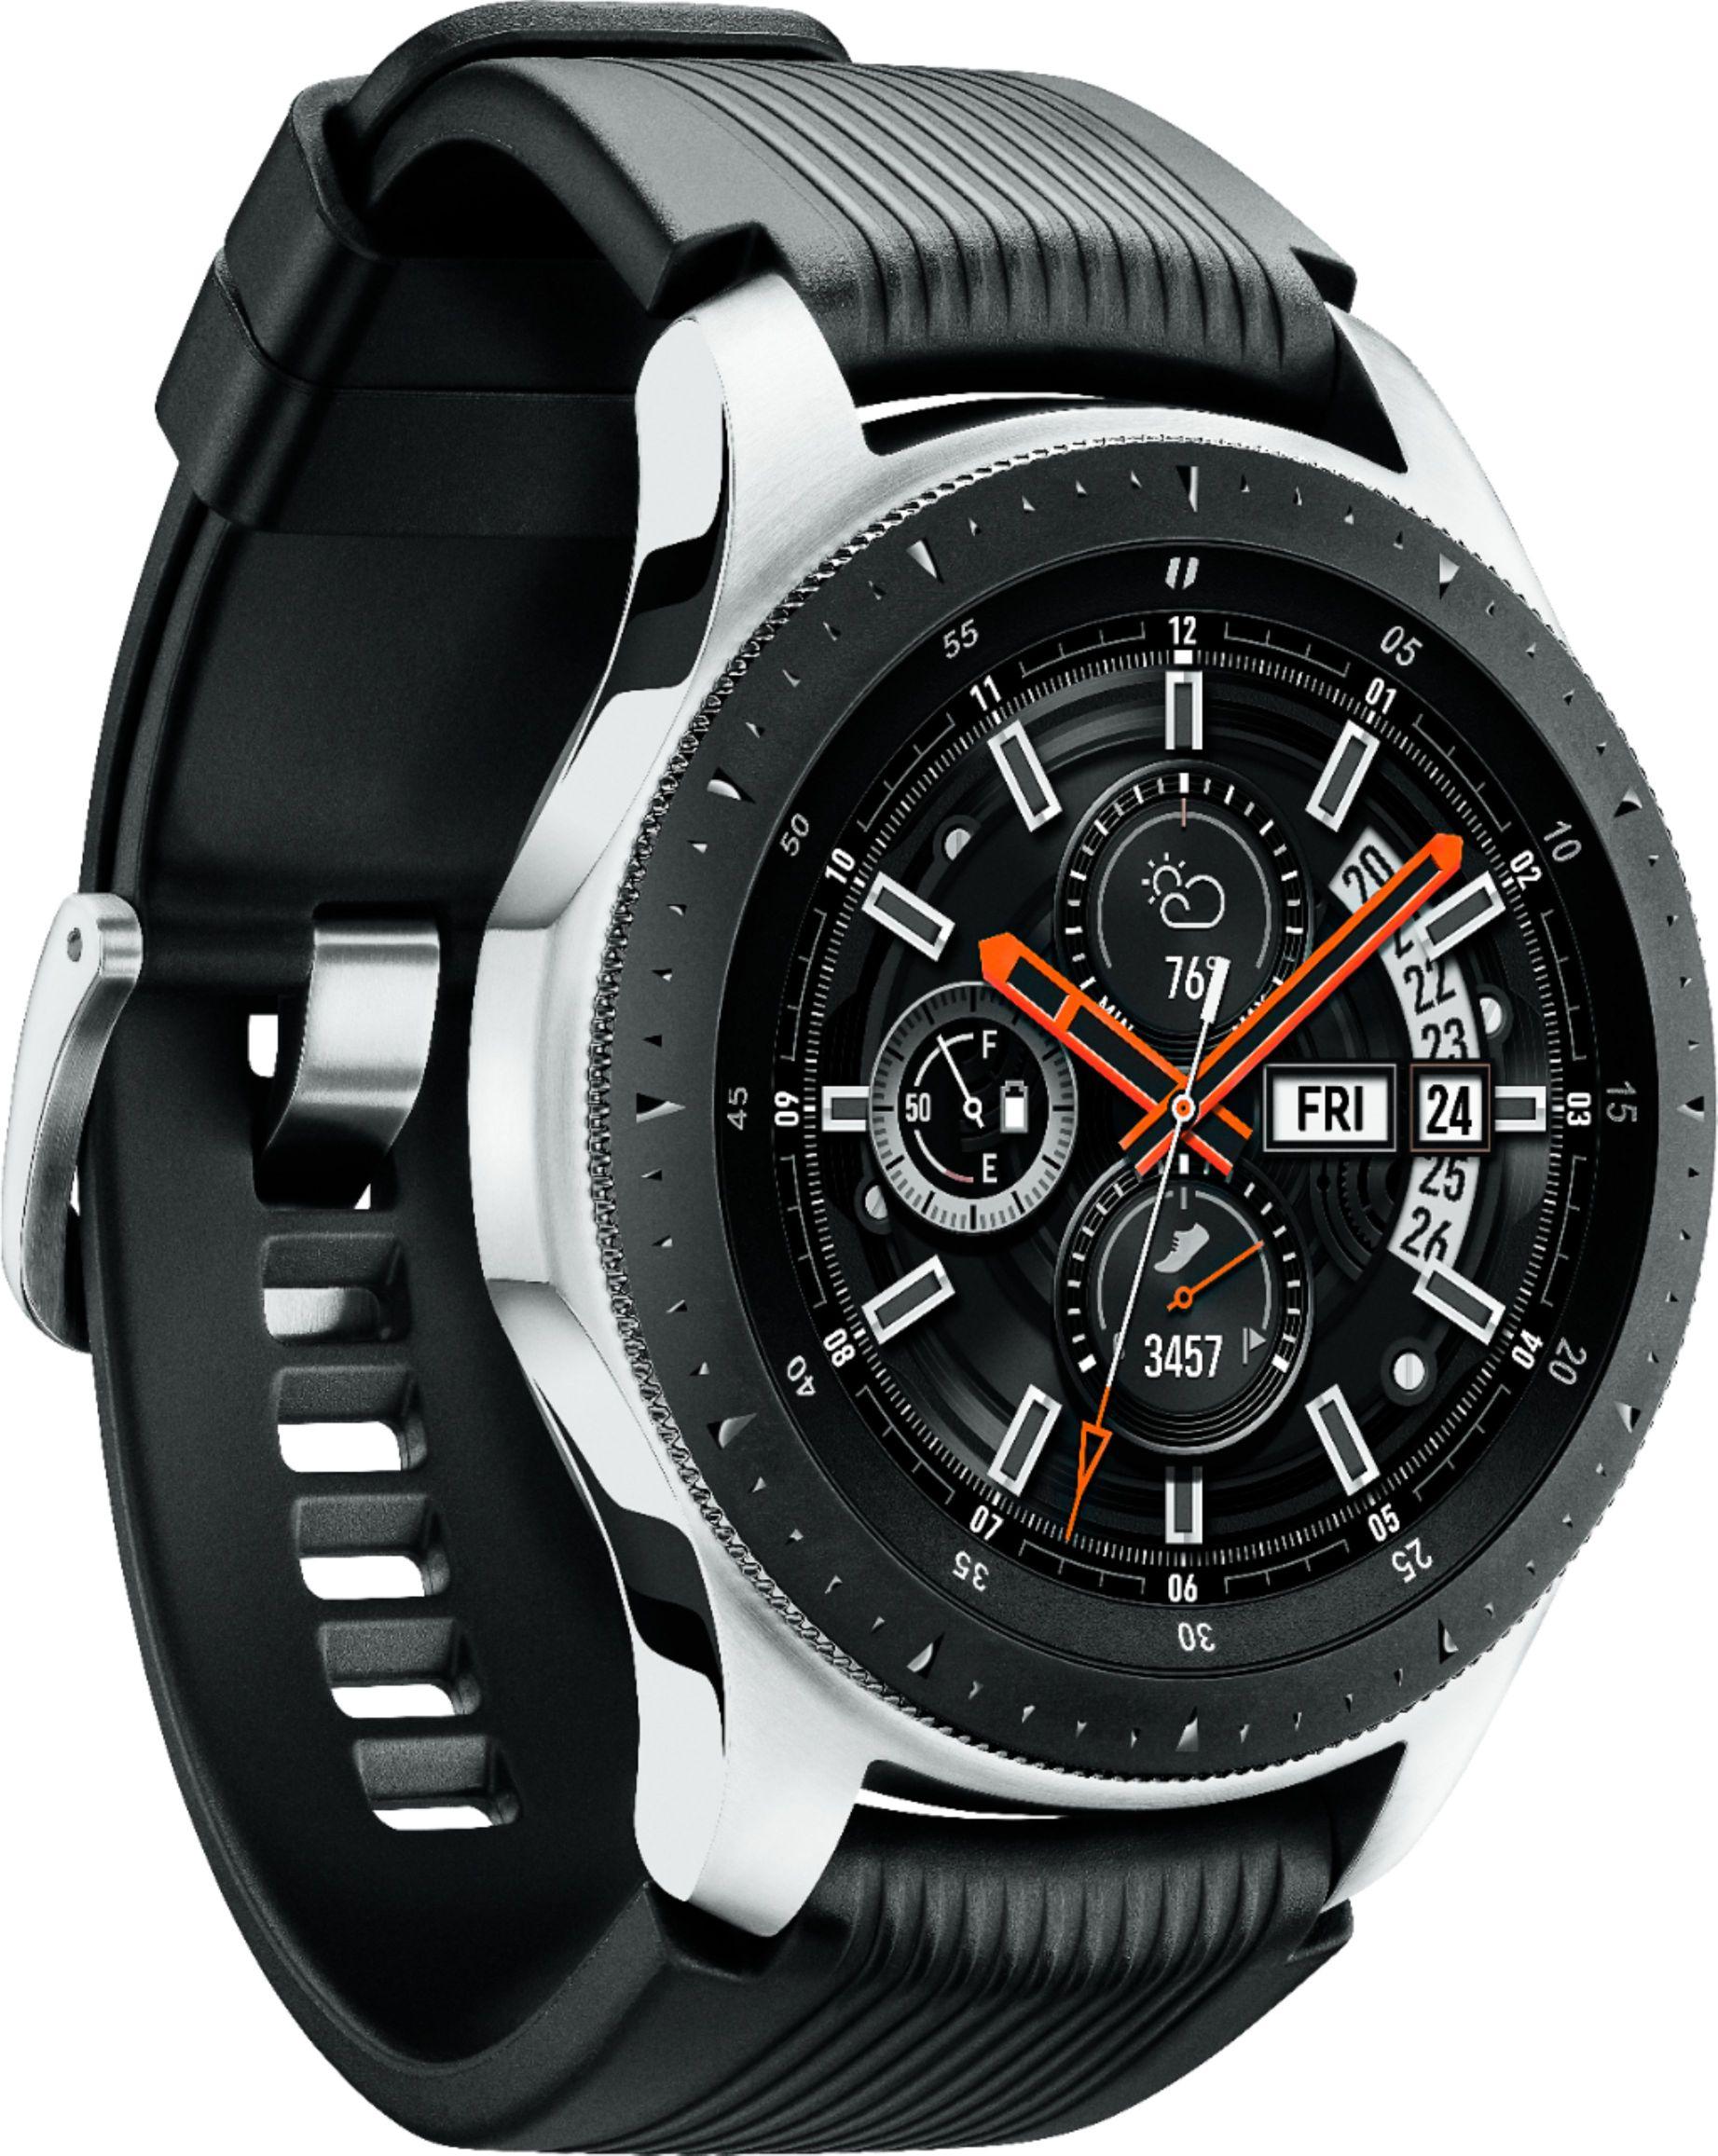 Montre Connectée Samsung Galaxy Watch Silver - 46mm